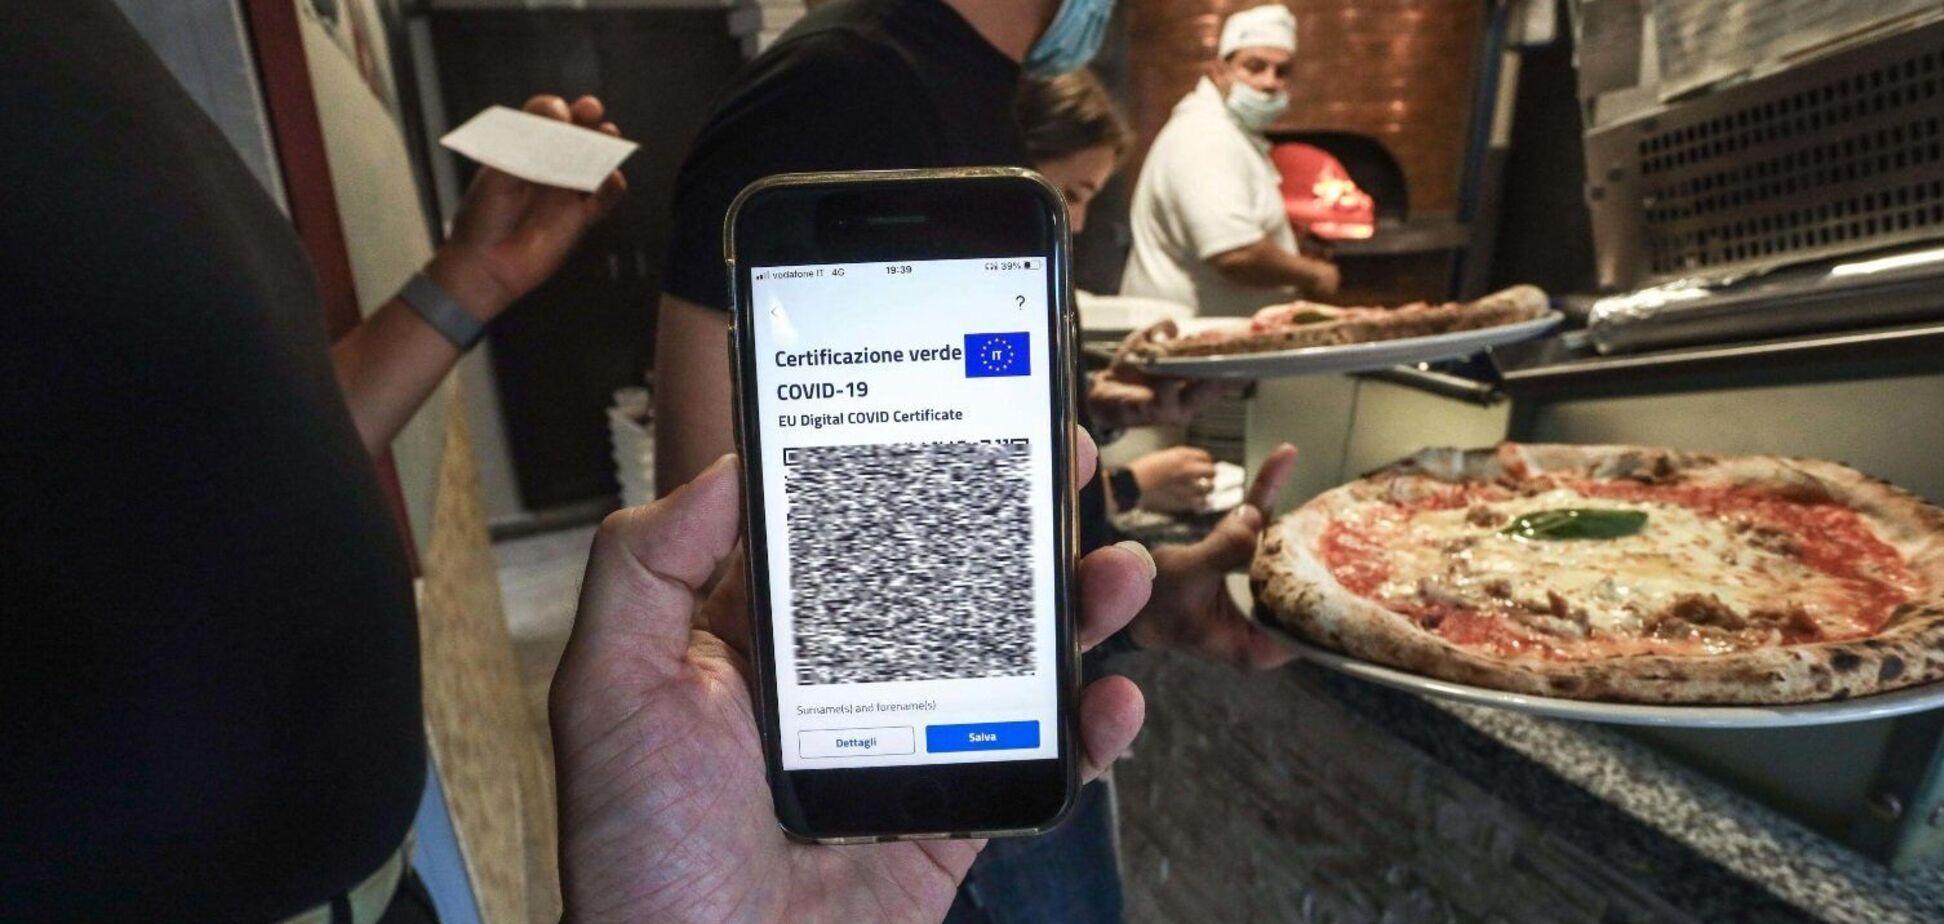 В Италии мужчину оштрафовали за обед в пиццерии без COVID-паспорта